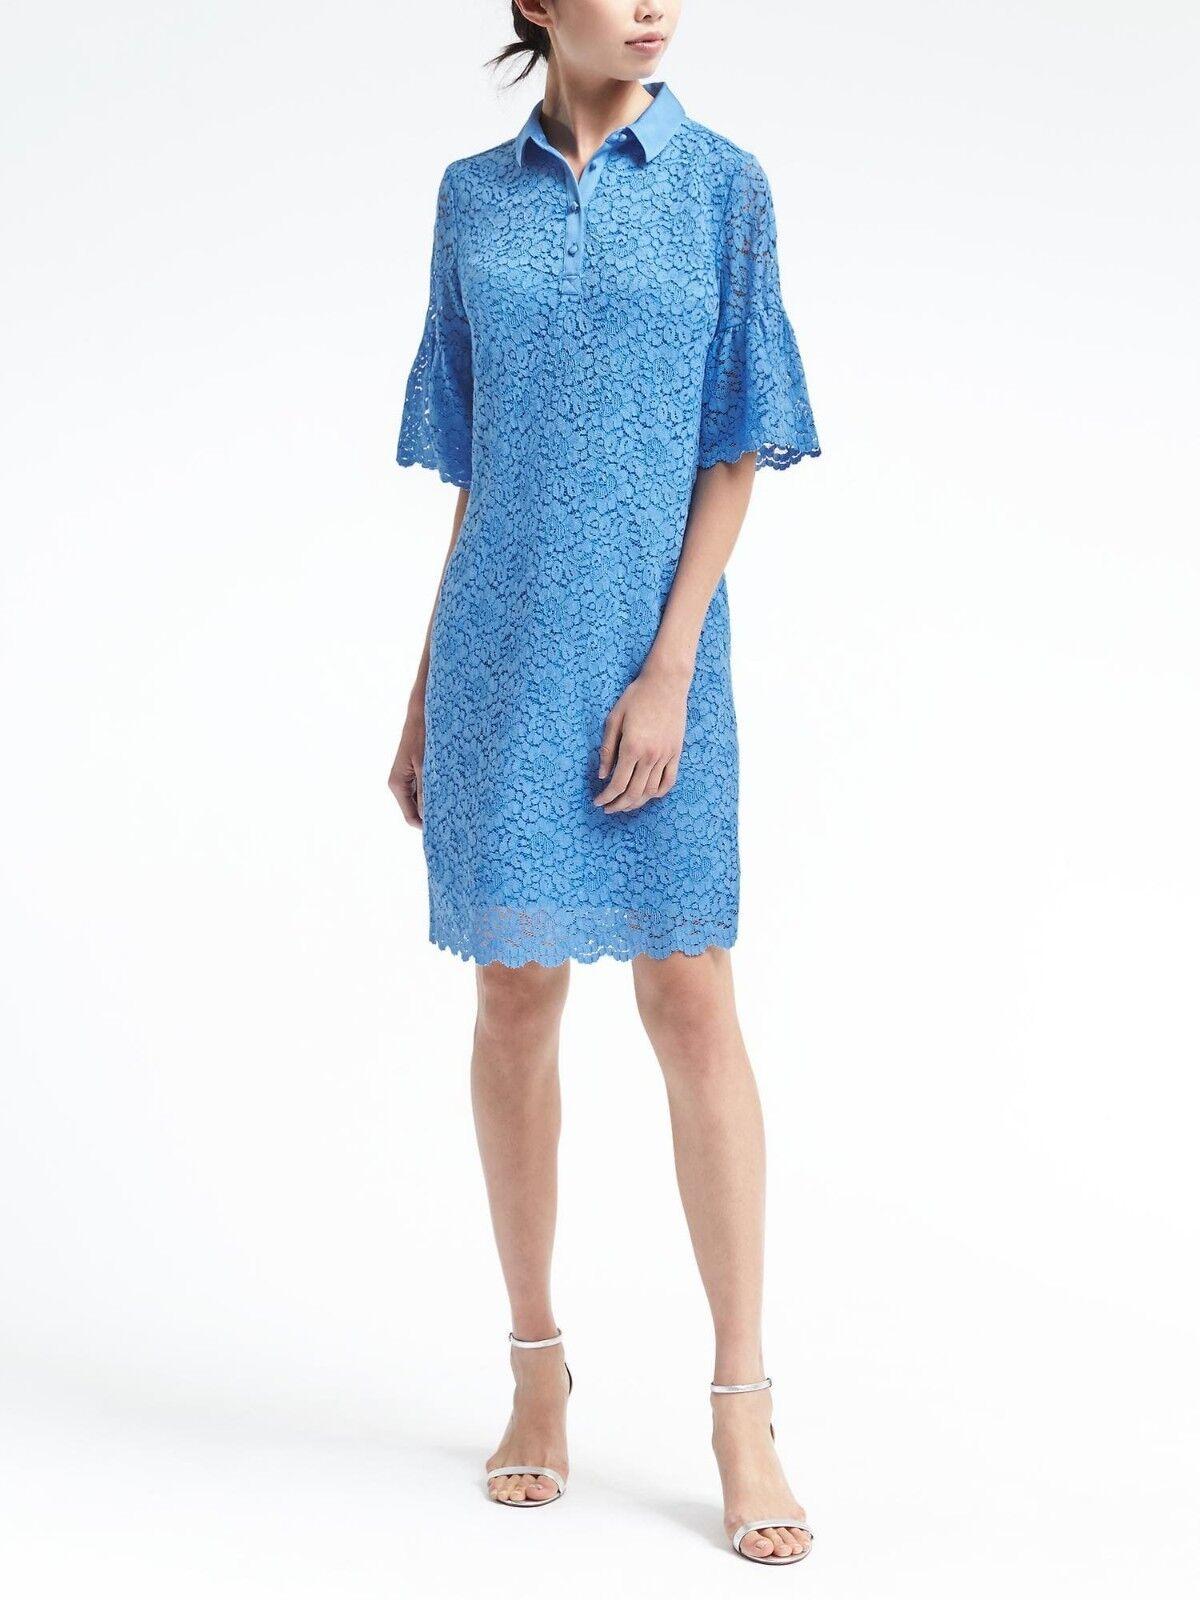 NWT Banana Flutter-Sleeve Lace Polo Dress, Light Blau Größe M      v1127